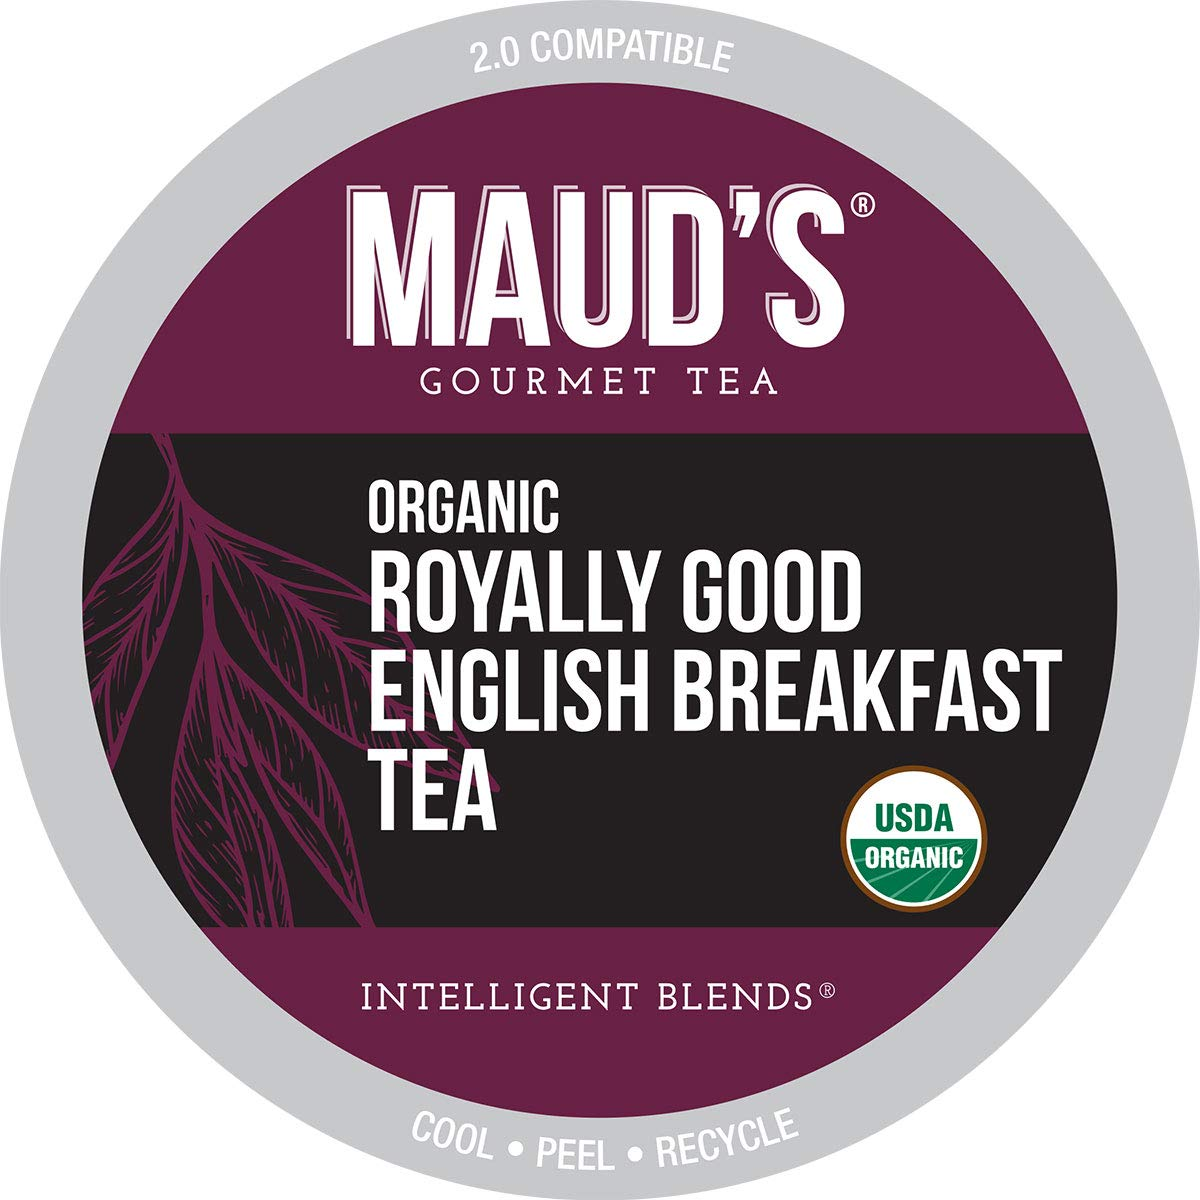 Maud's Organic English Breakfast Tea (Royally Good English Breakfast), 24ct. Recyclable Single Serve Organic Black Tea Pods – 100% Organic Tea California Blend, Keurig Black Tea K Cups Compatible